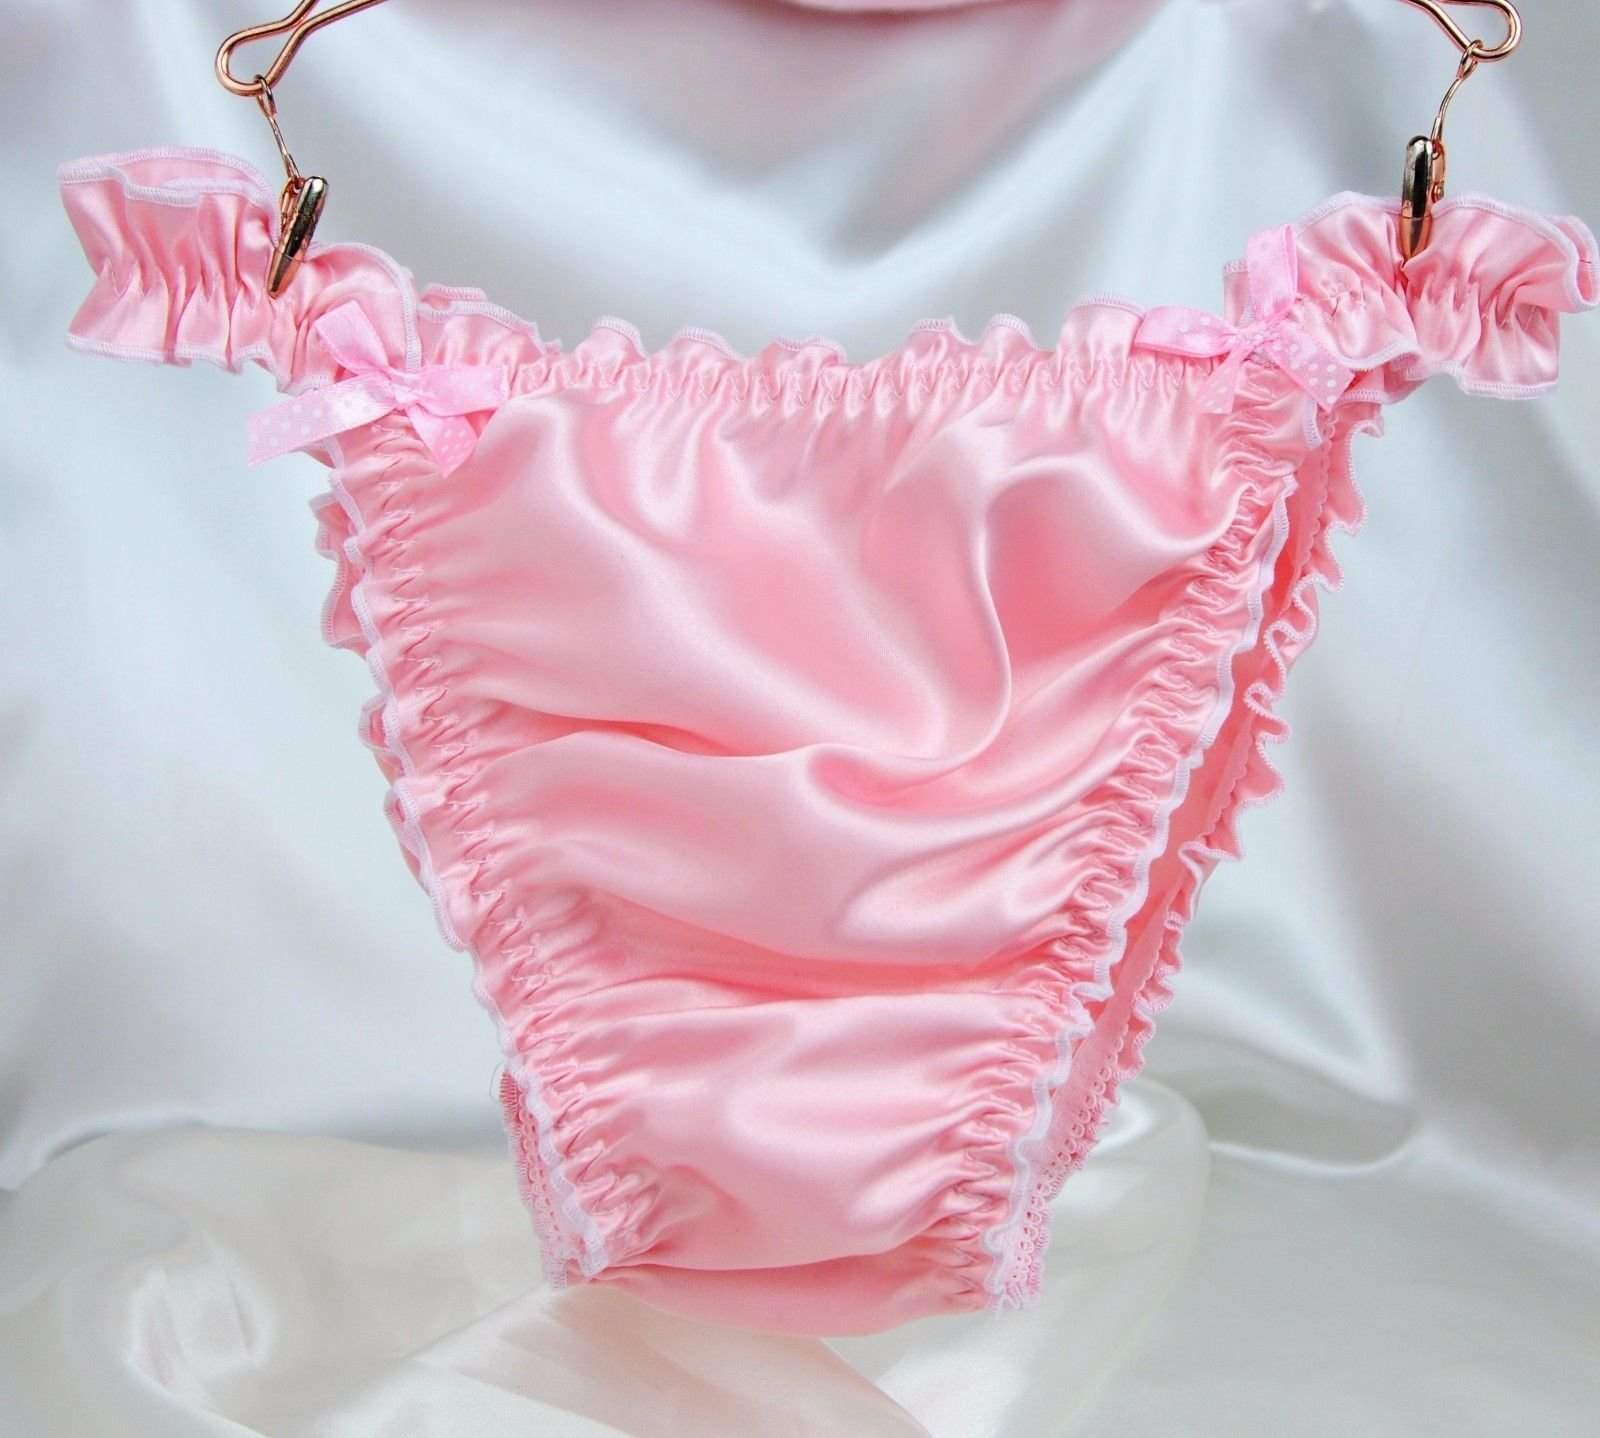 RB SISSY PANTIES!  Ruffled Frilly girly string bikini Satin mens panties Many Colors! 00180